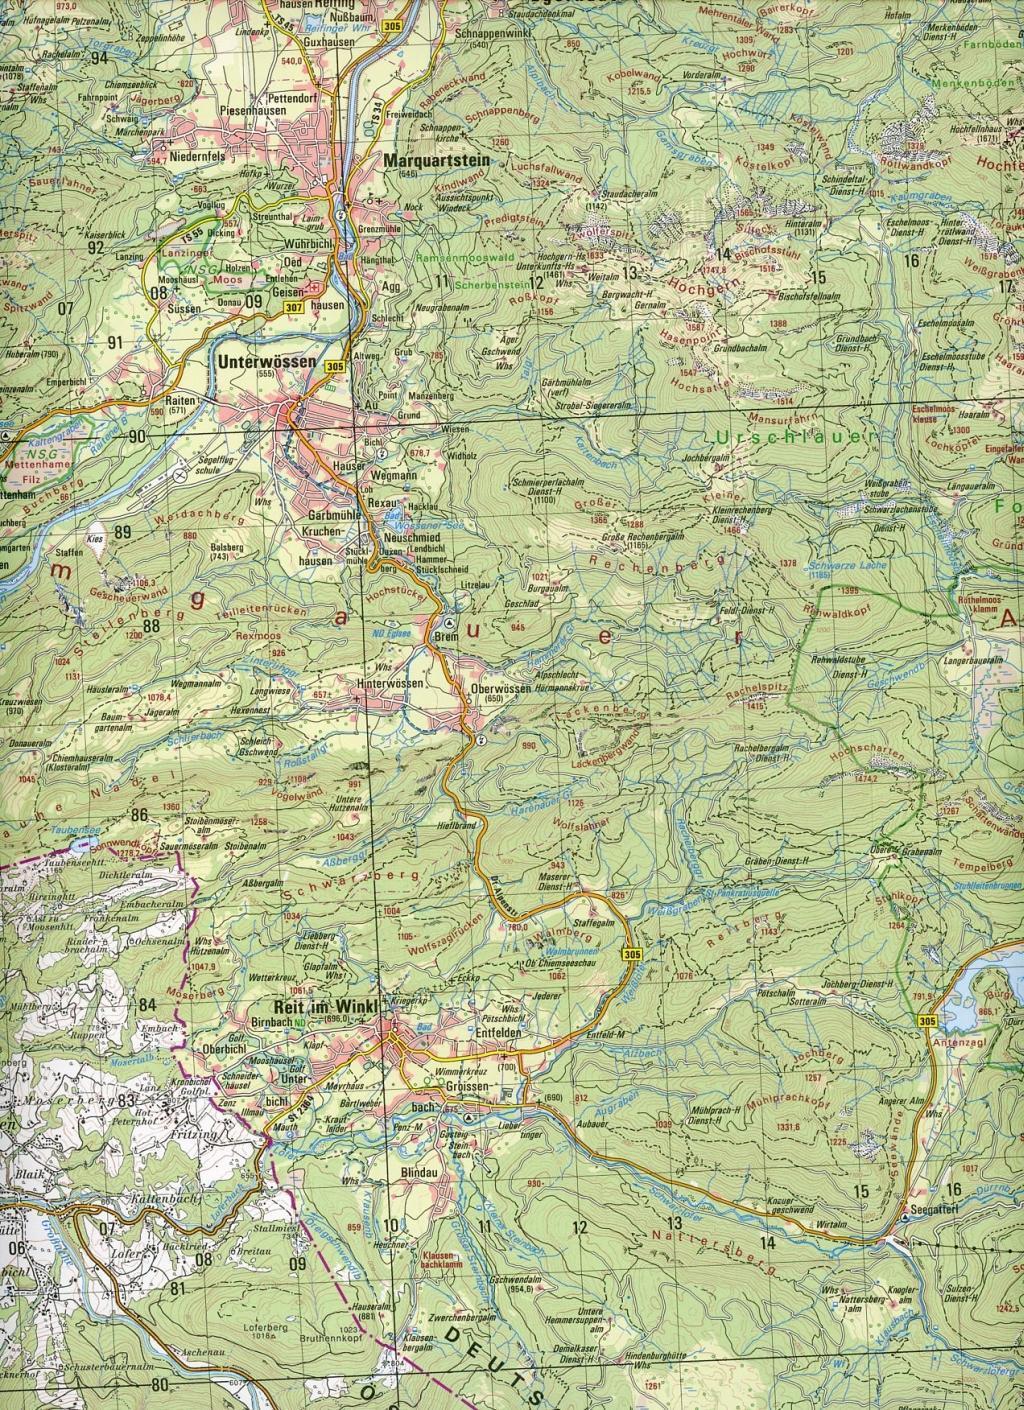 Ruhpolding 1 : 50 000. Normalausgabe  Topographische Karten Bayern 1 : 50 000